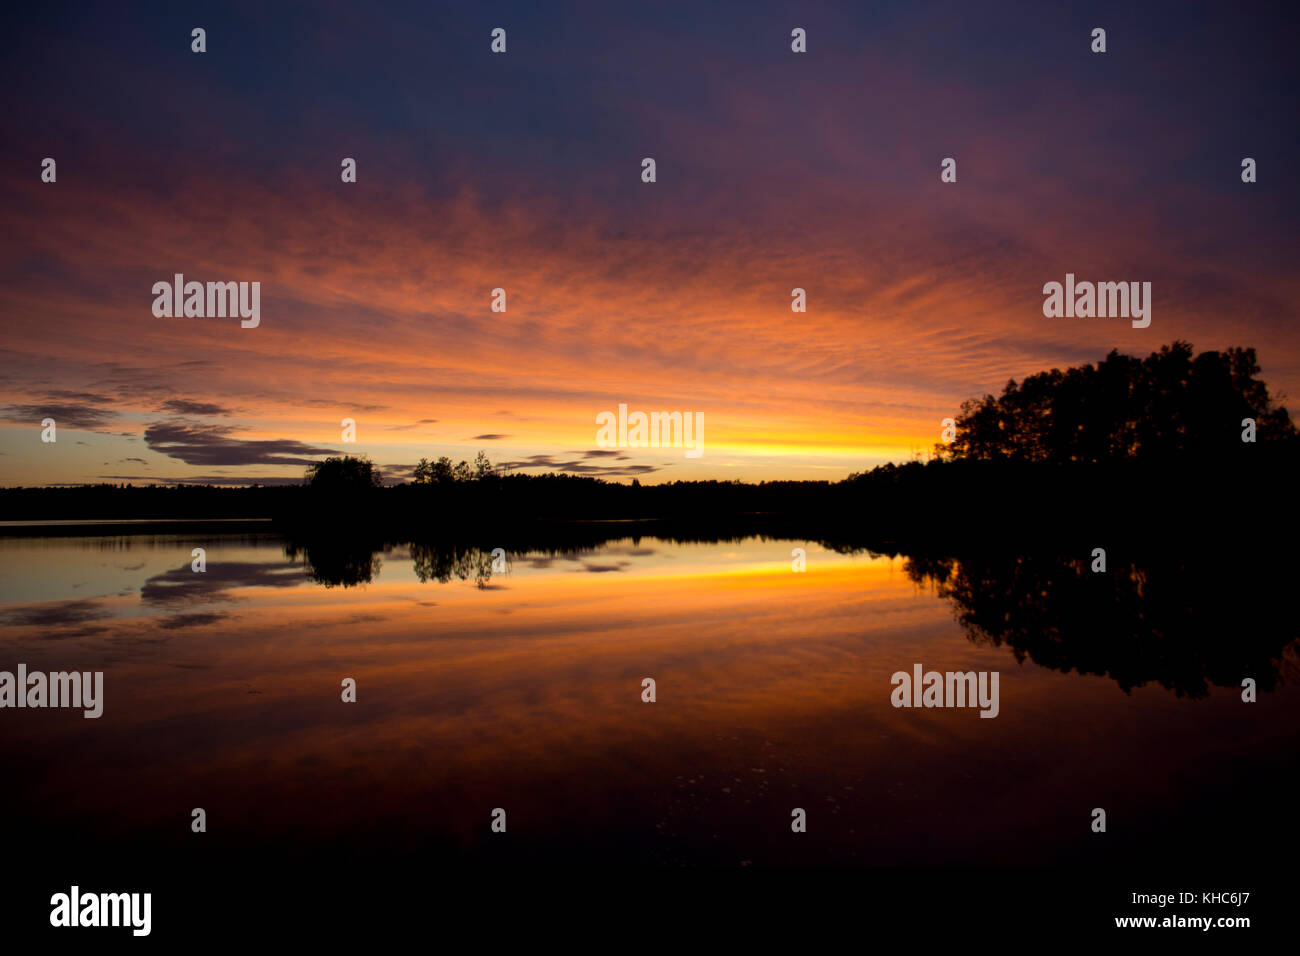 water-mirror at sunset *** Local Caption *** sweden, skane, örkeljunga, lake, store sjö, sunset, clouds, - Stock Image